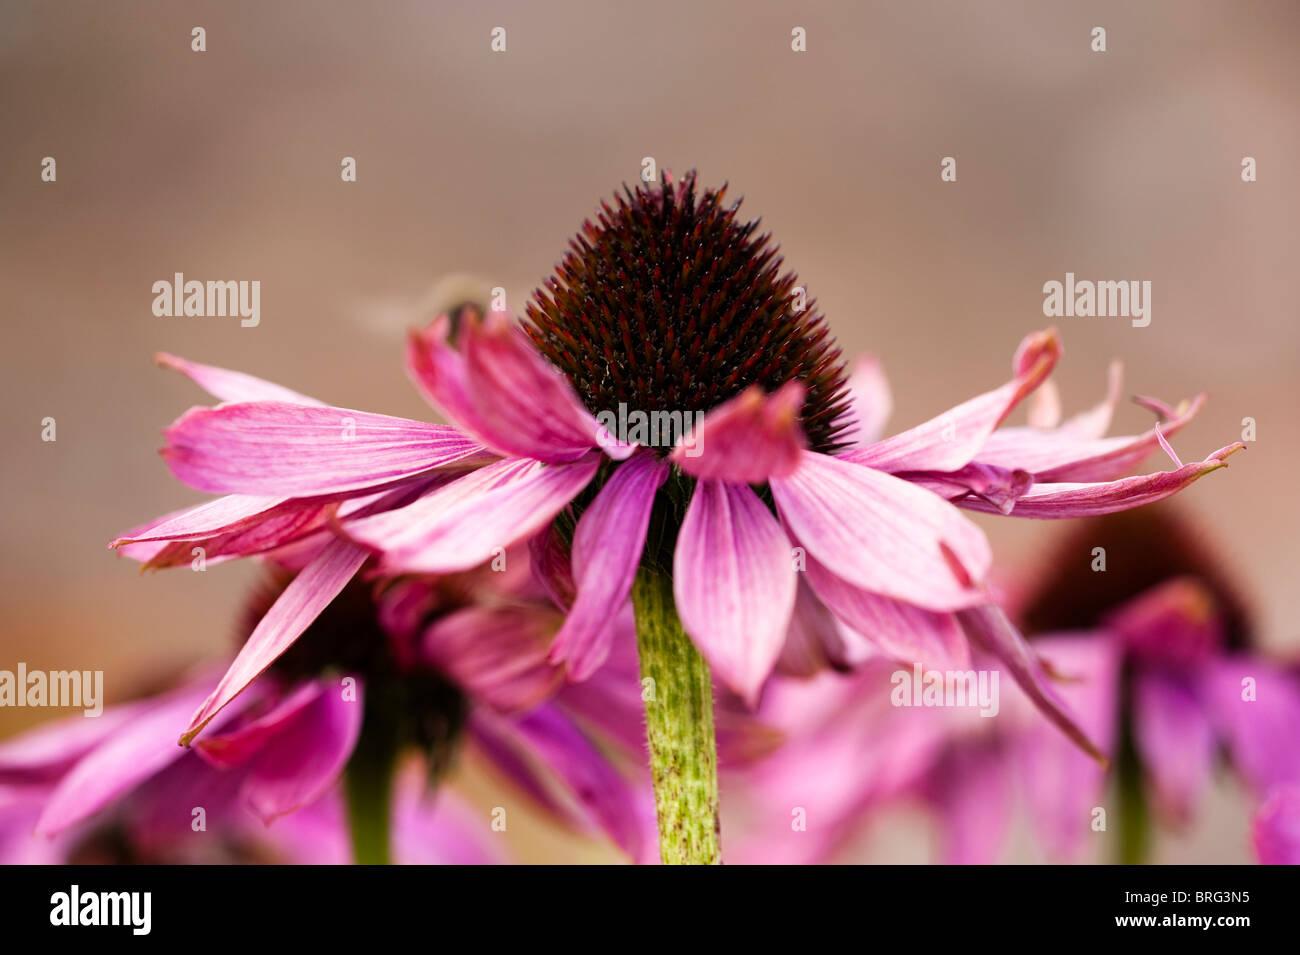 Echinacea purpurea, Eastern Purple Coneflower or Purple Coneflower, in bloom - Stock Image